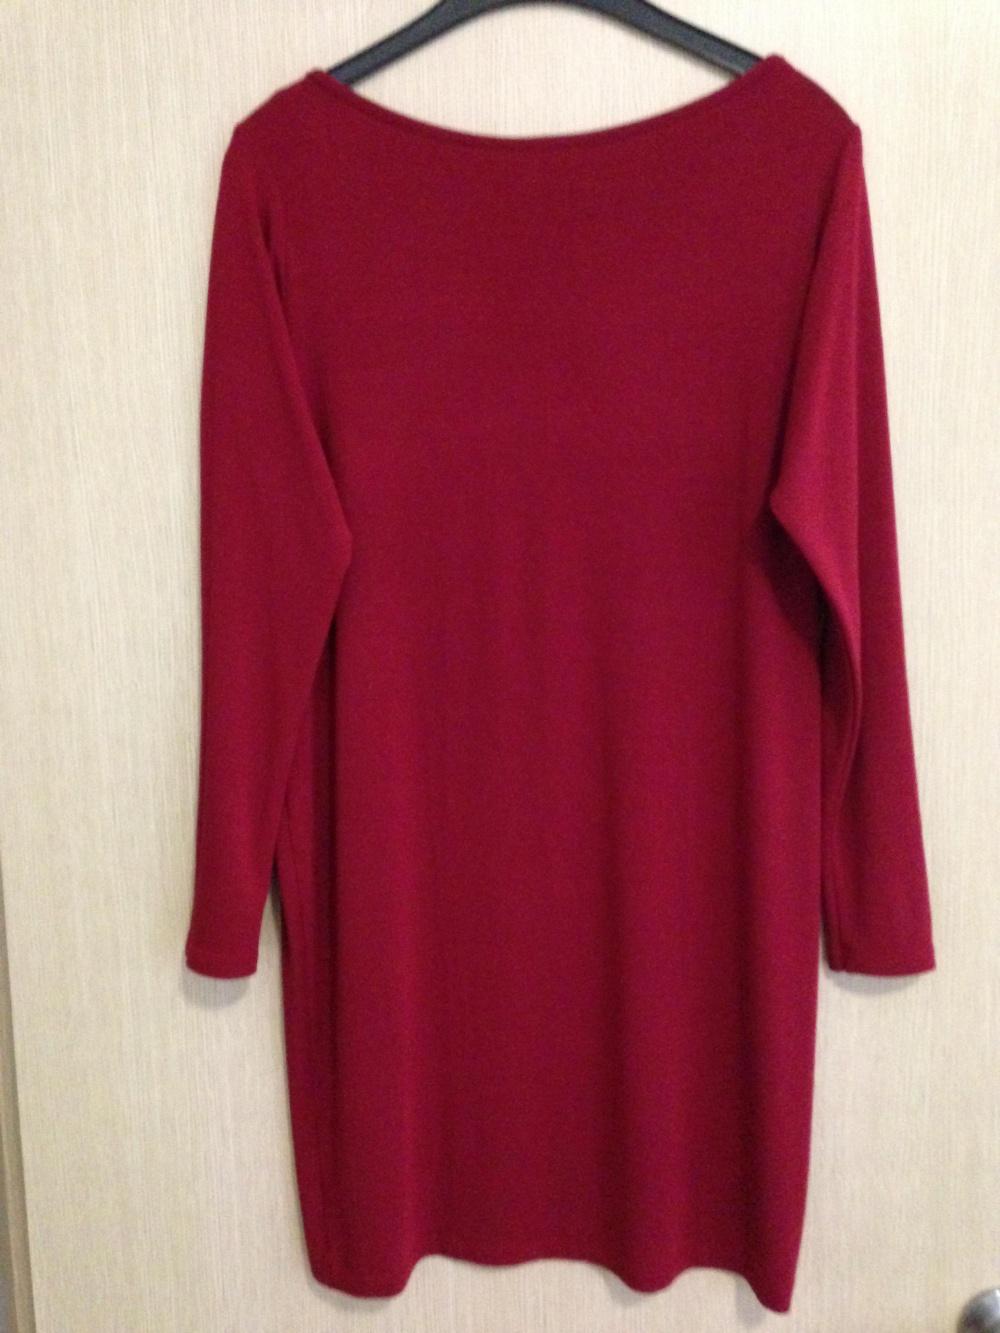 "Платье "" SWEEWE "", 46-48 размер, Франция."